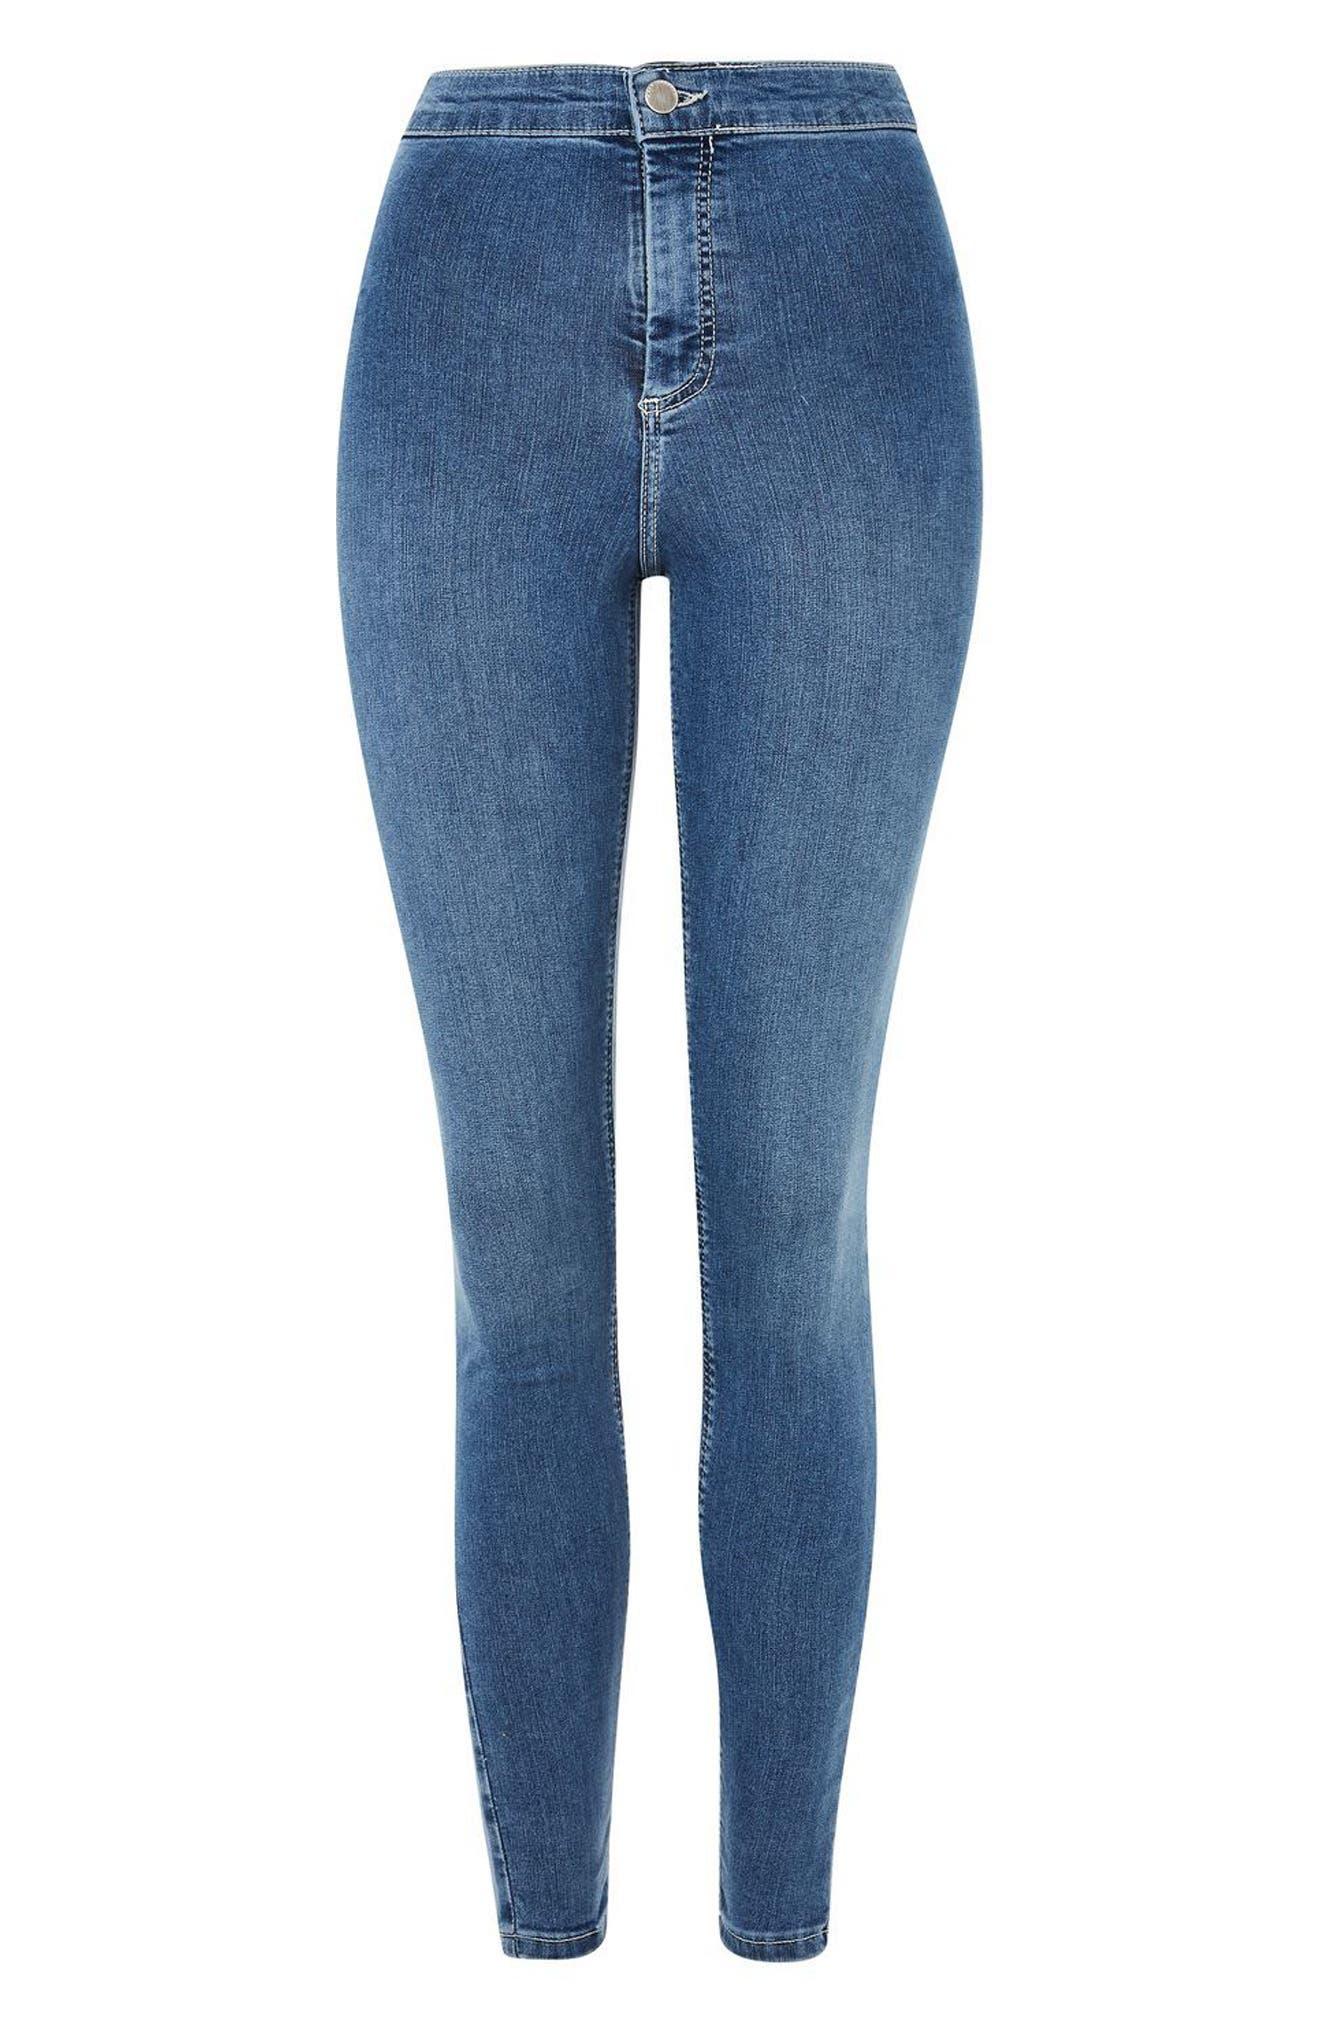 Alternate Image 3  - Topshop Joni Contrast Stitch High Rise Skinny Jeans